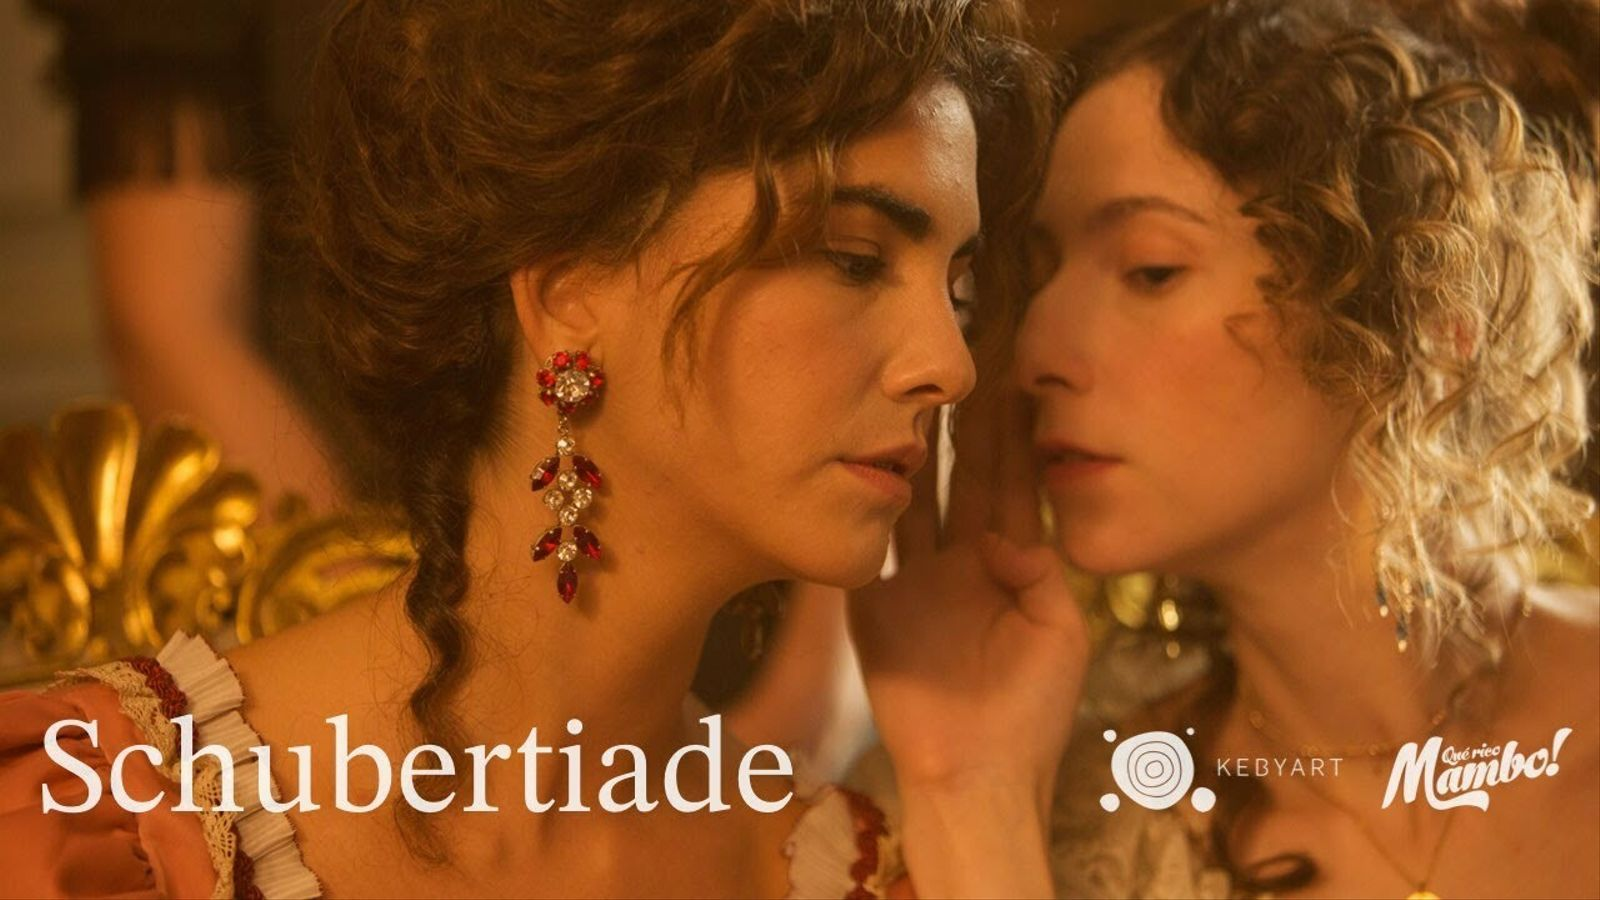 Kebyart, 'Schubertiade', videoclip